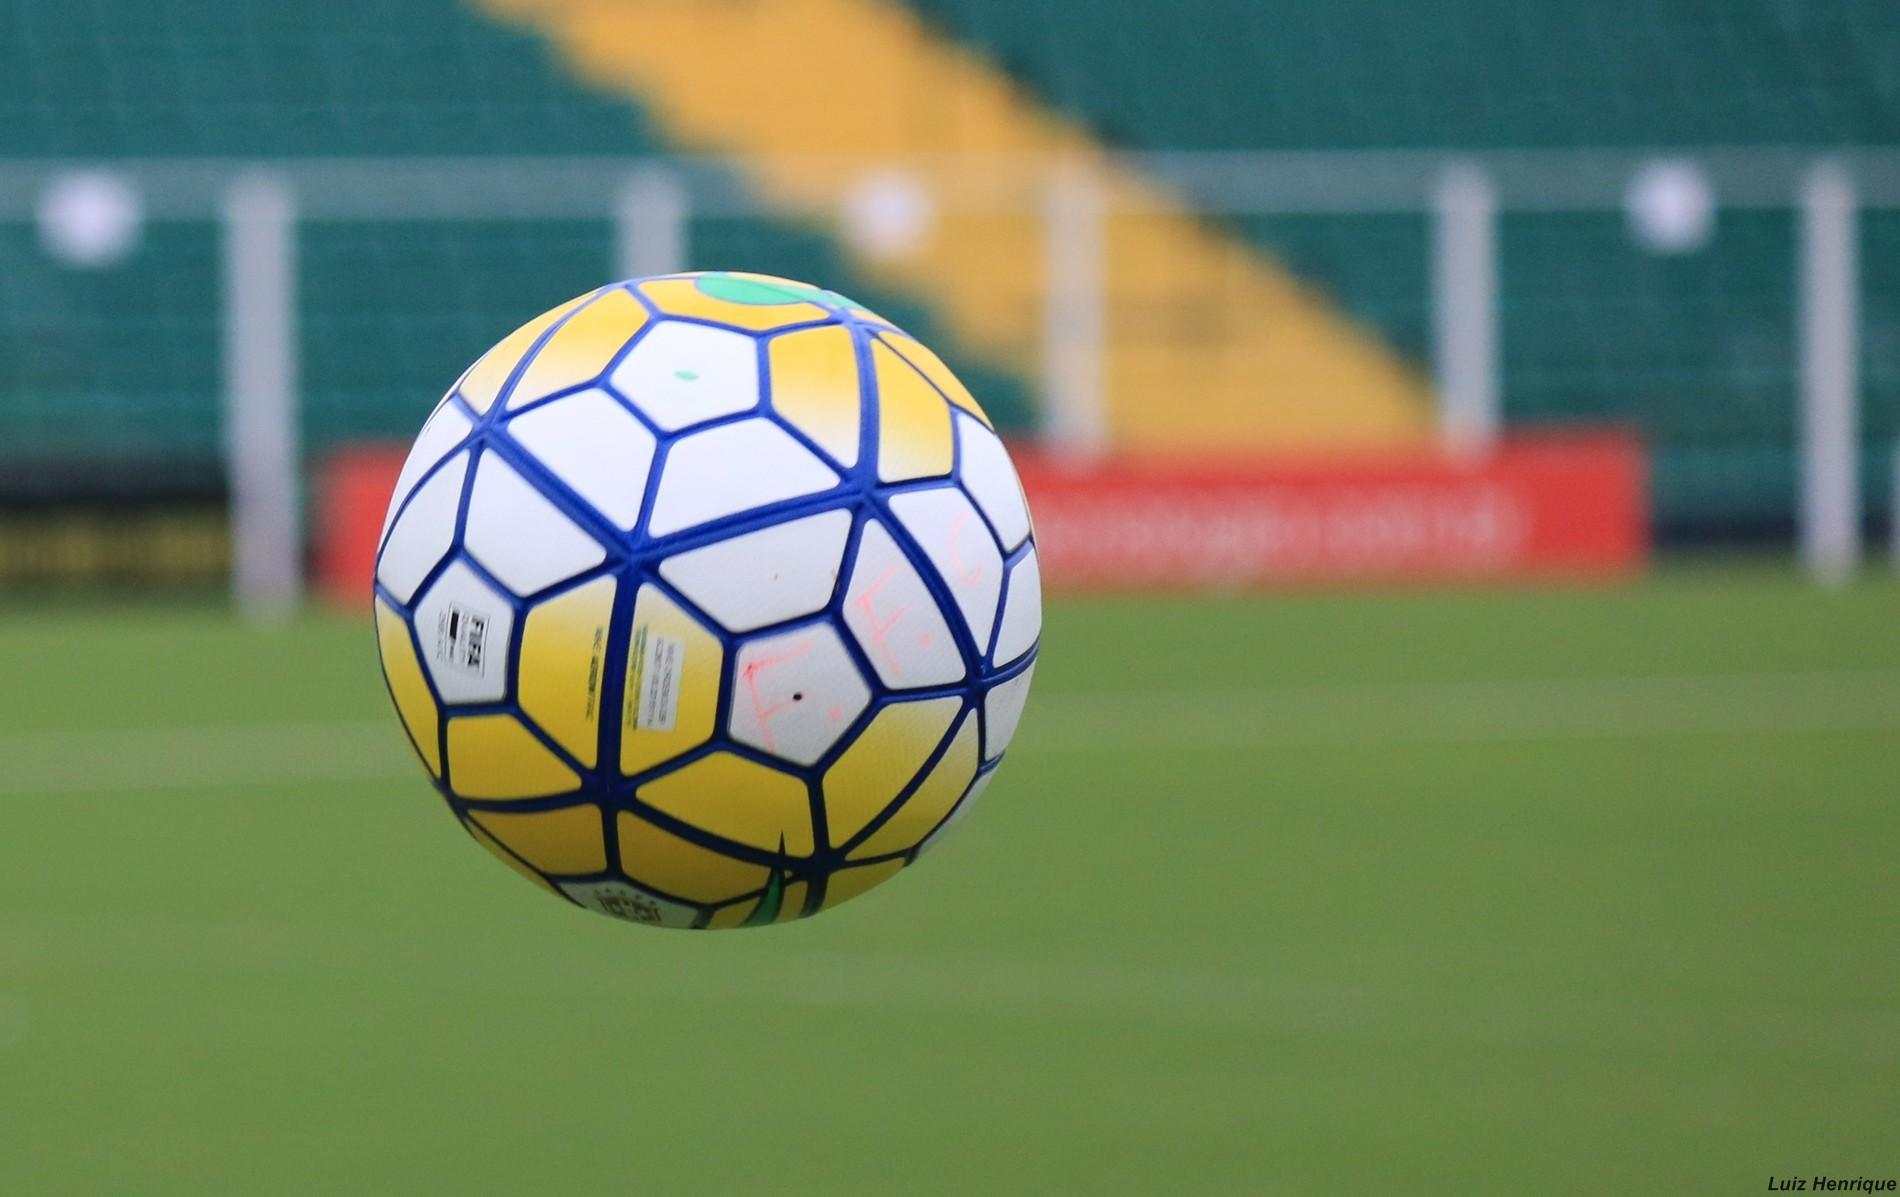 http://globoesporte globo com/mt/futebol/noticia/2016/08